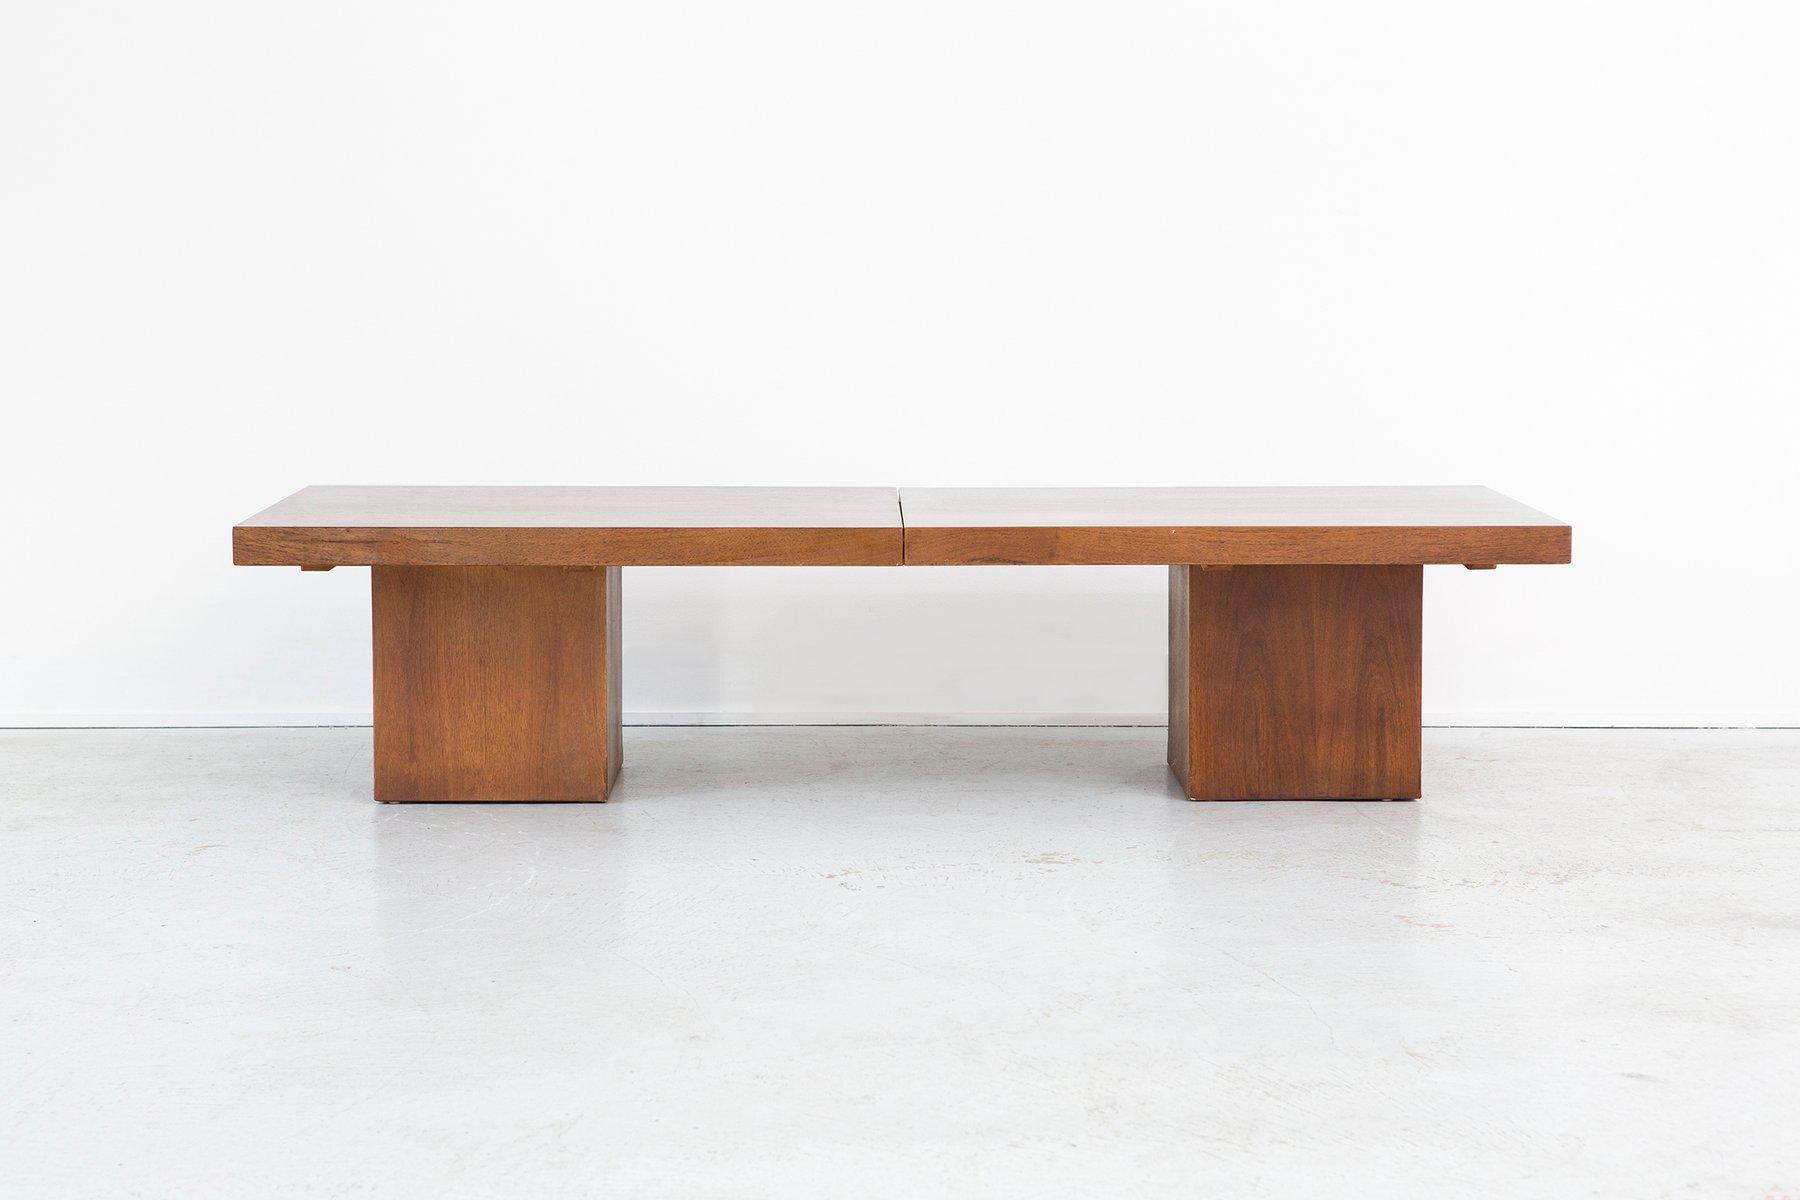 Extending Coffee Table By John Keal For Brown Saltman, 1960s